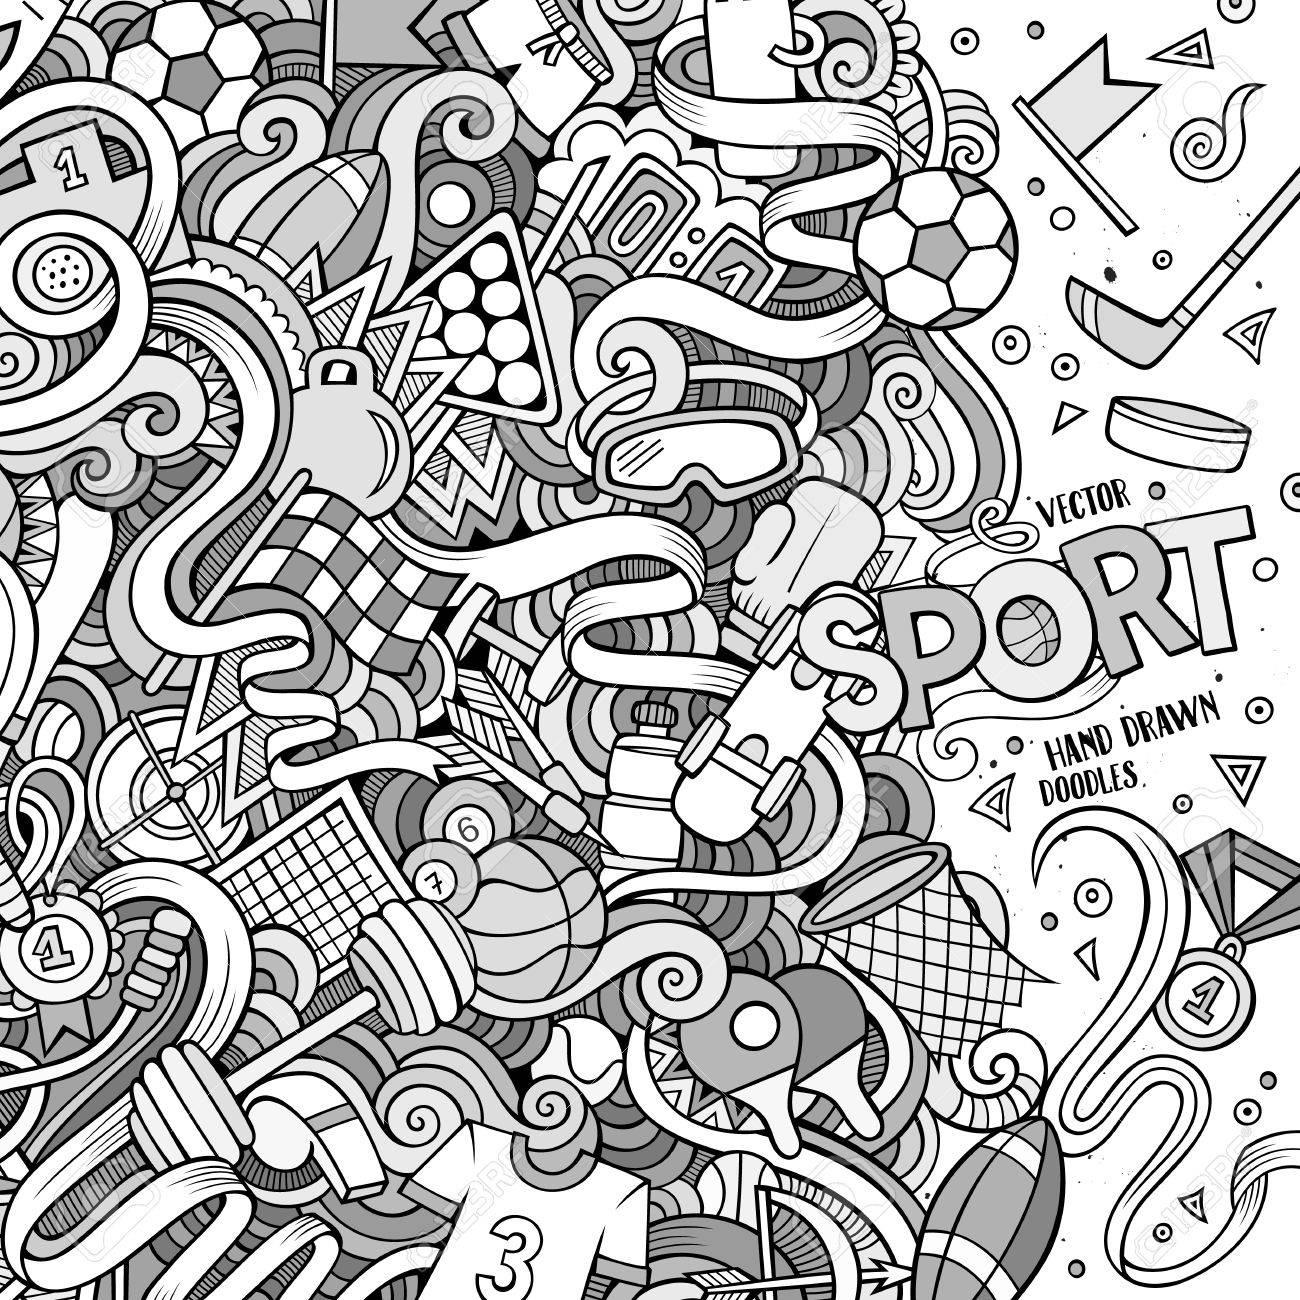 Dessin Anime Mignon Doodles Dessines A La Main Sport Cadre Design